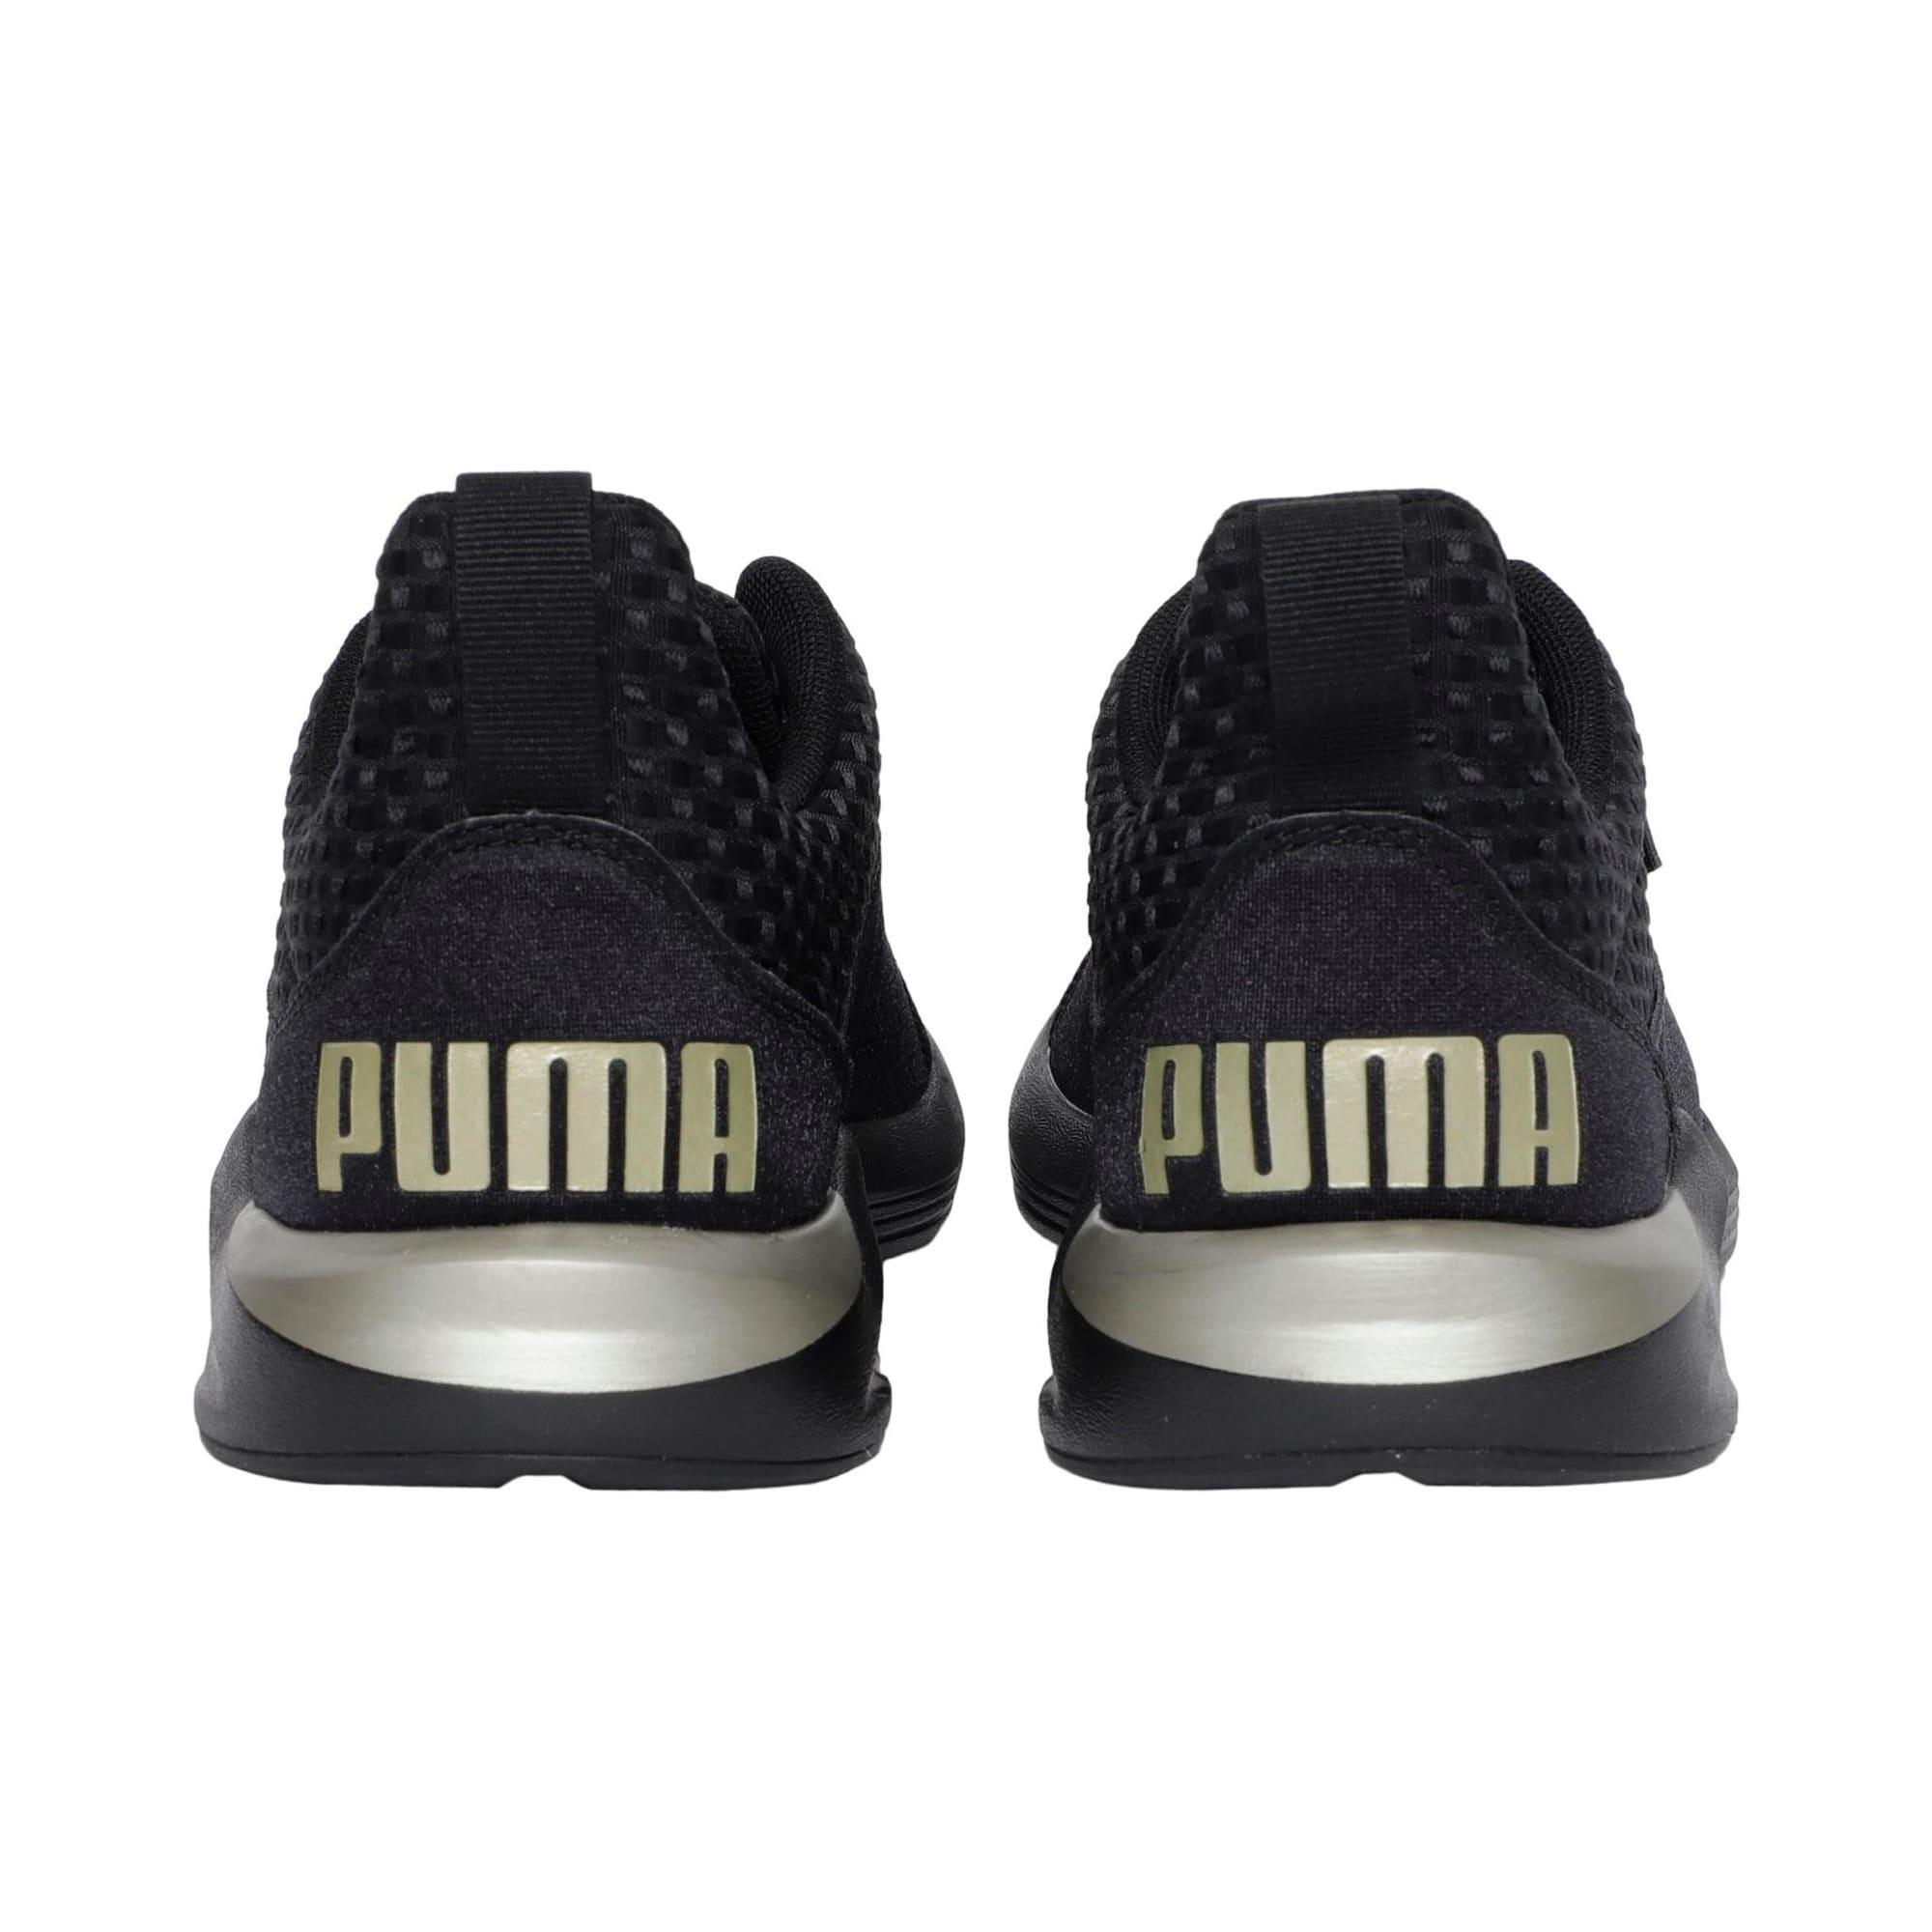 Thumbnail 3 of Prodigy VT Wn's, Puma Black-Metallic Gold, medium-IND